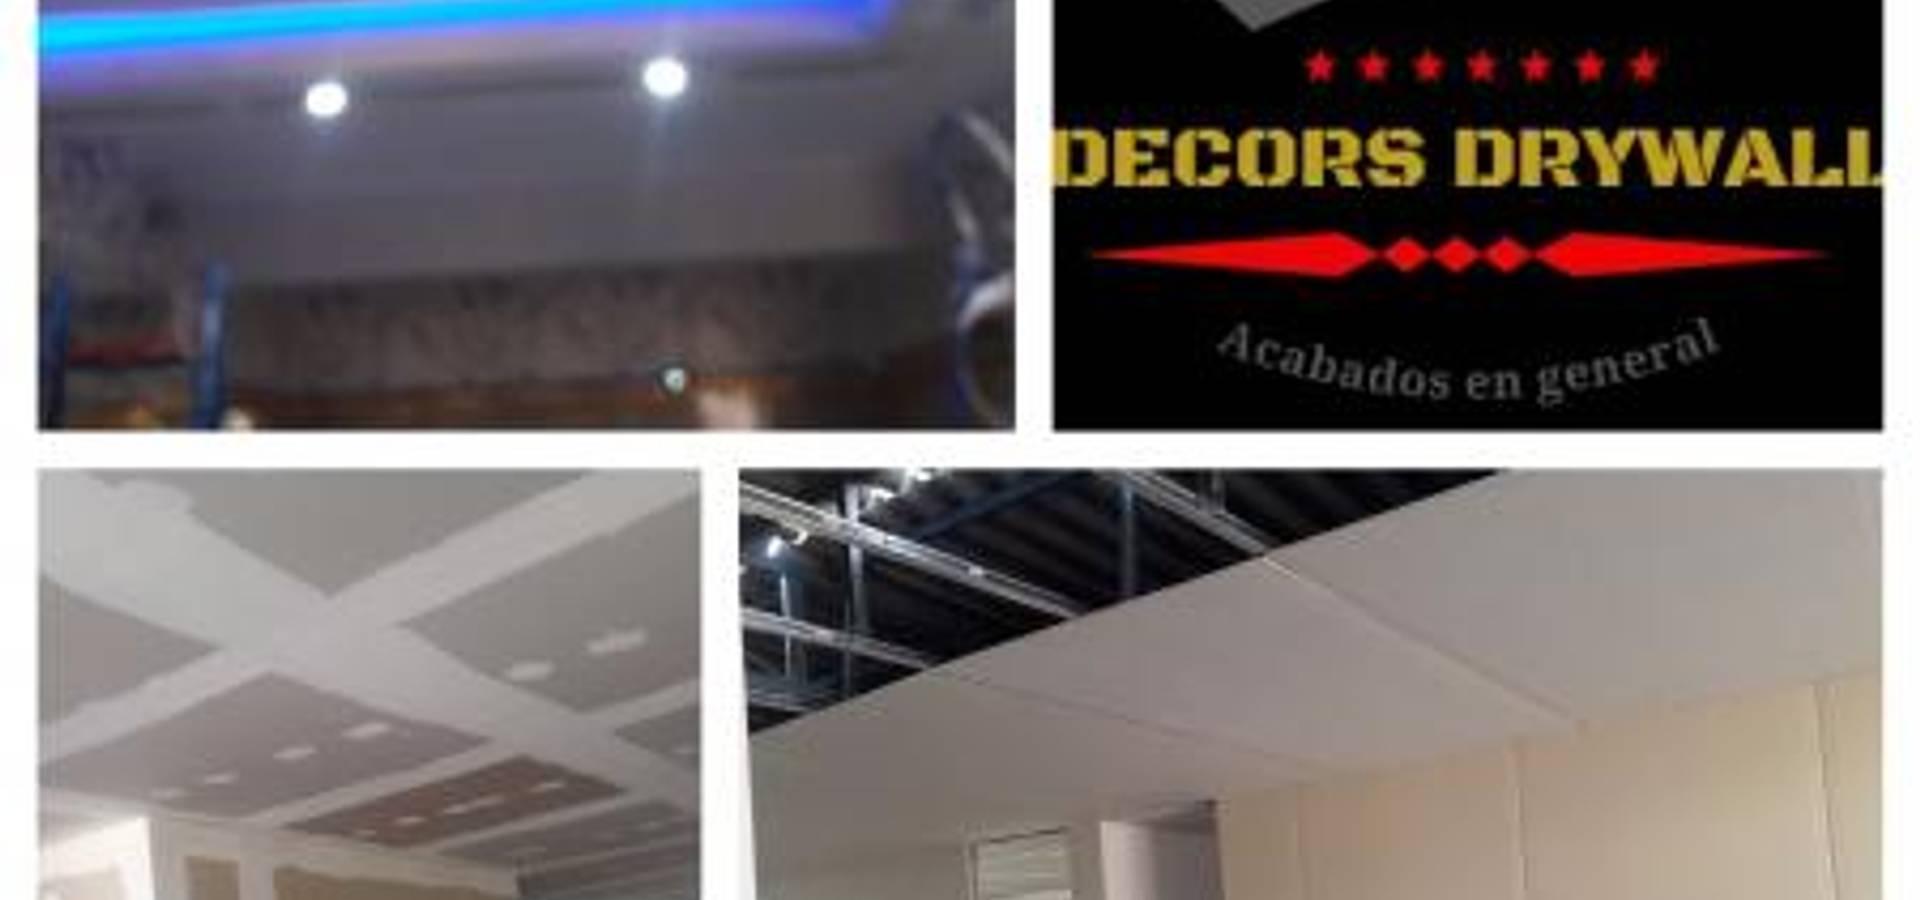 decors drywall